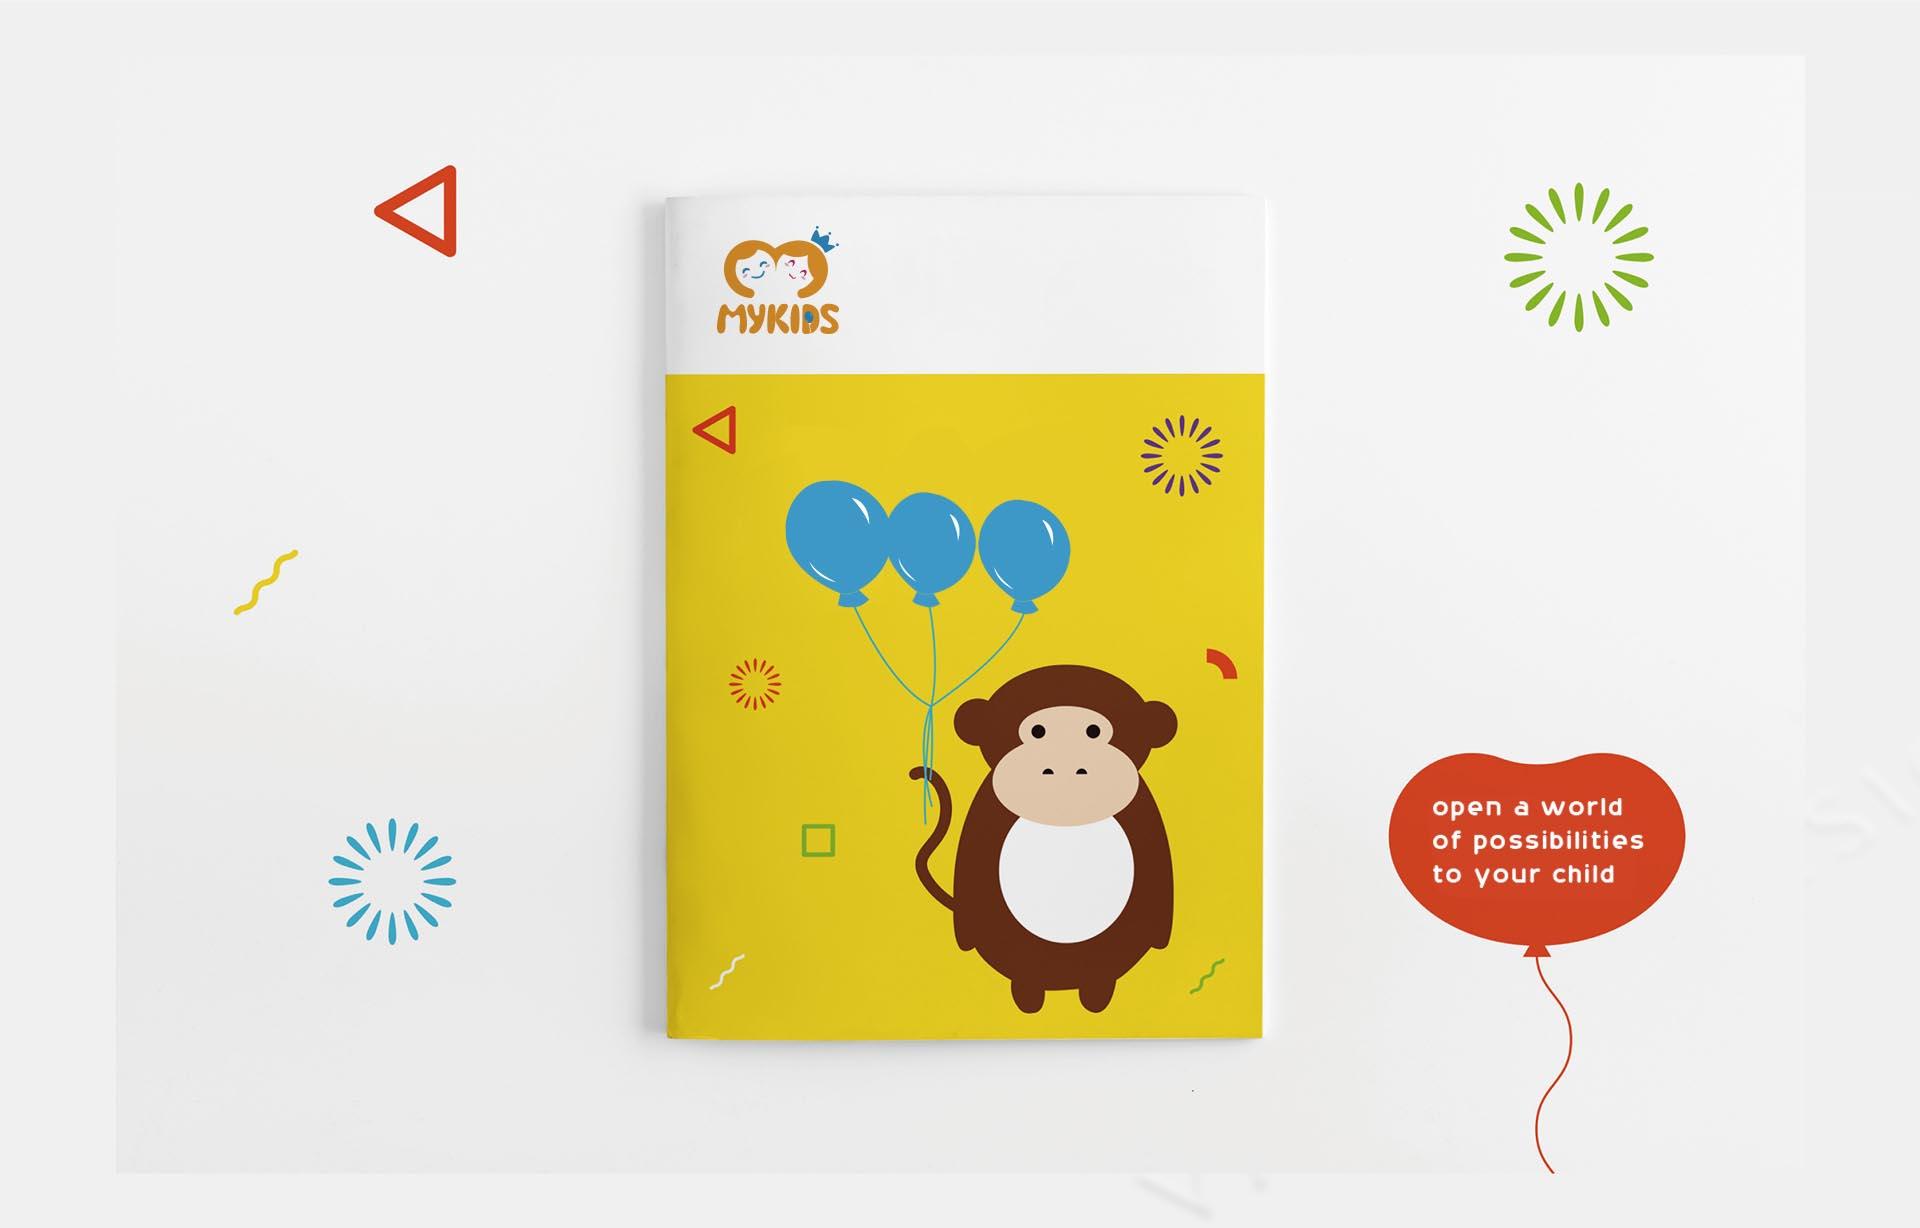 MYKIDS蒙奇思幼儿园万博安卓版logo万博网页版手机登录vi万博网页版手机登录